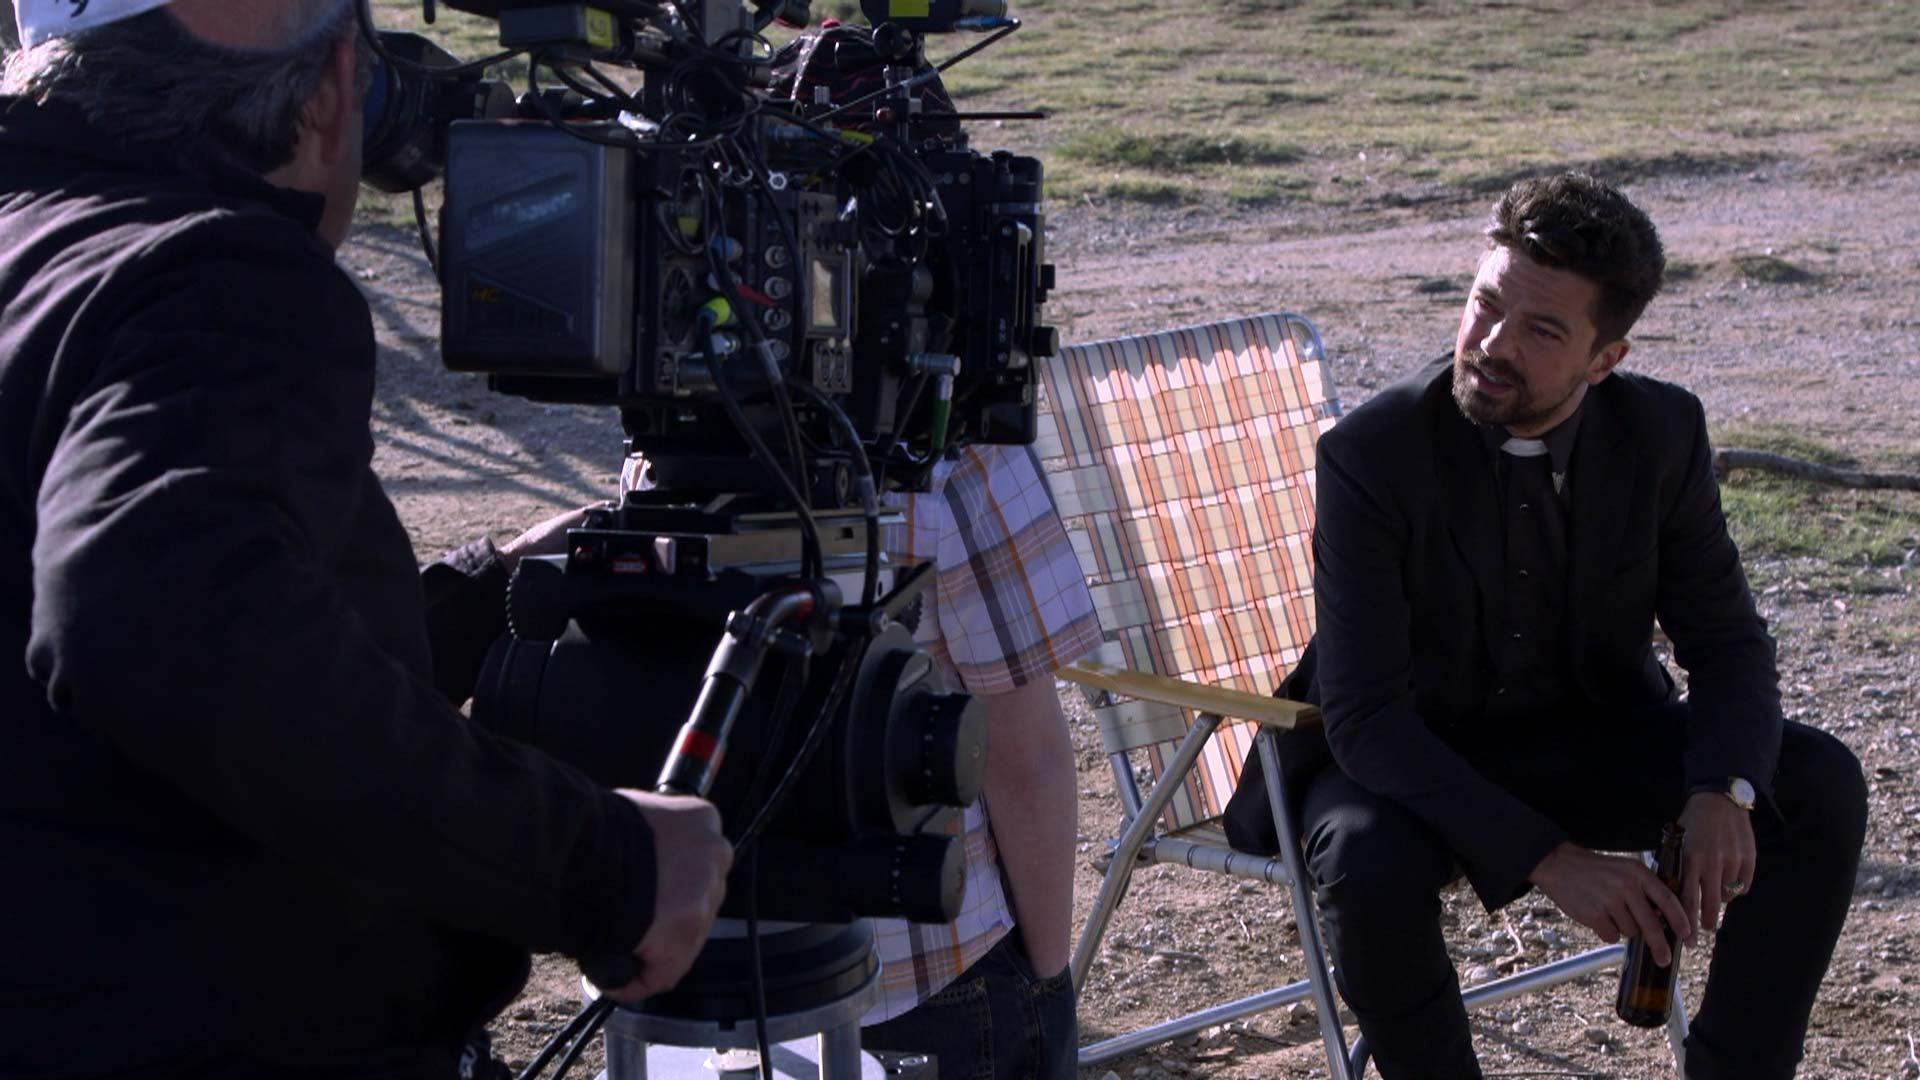 Wunderbar Amc Filmcrew Lebenslauf Galerie - Entry Level Resume ...